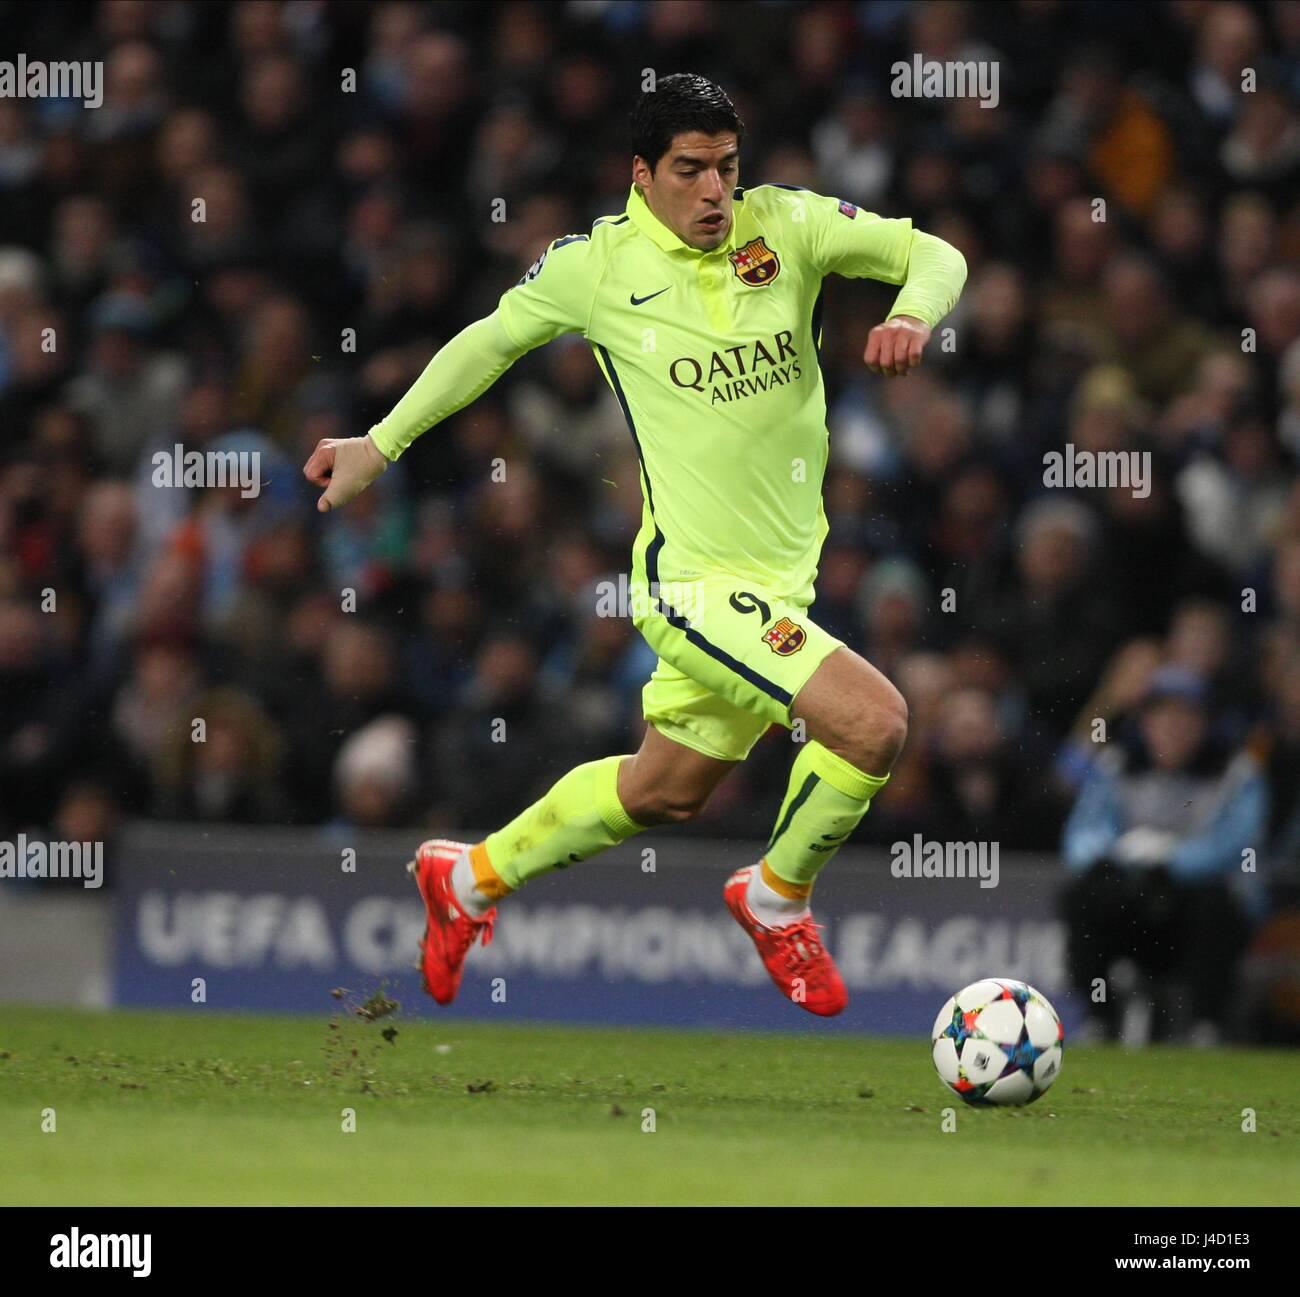 LUIS SUAREZ FC BARCELONA ETIHAD STADIUM MANCHESTER ENGLAND 24 February 2015 - Stock Image